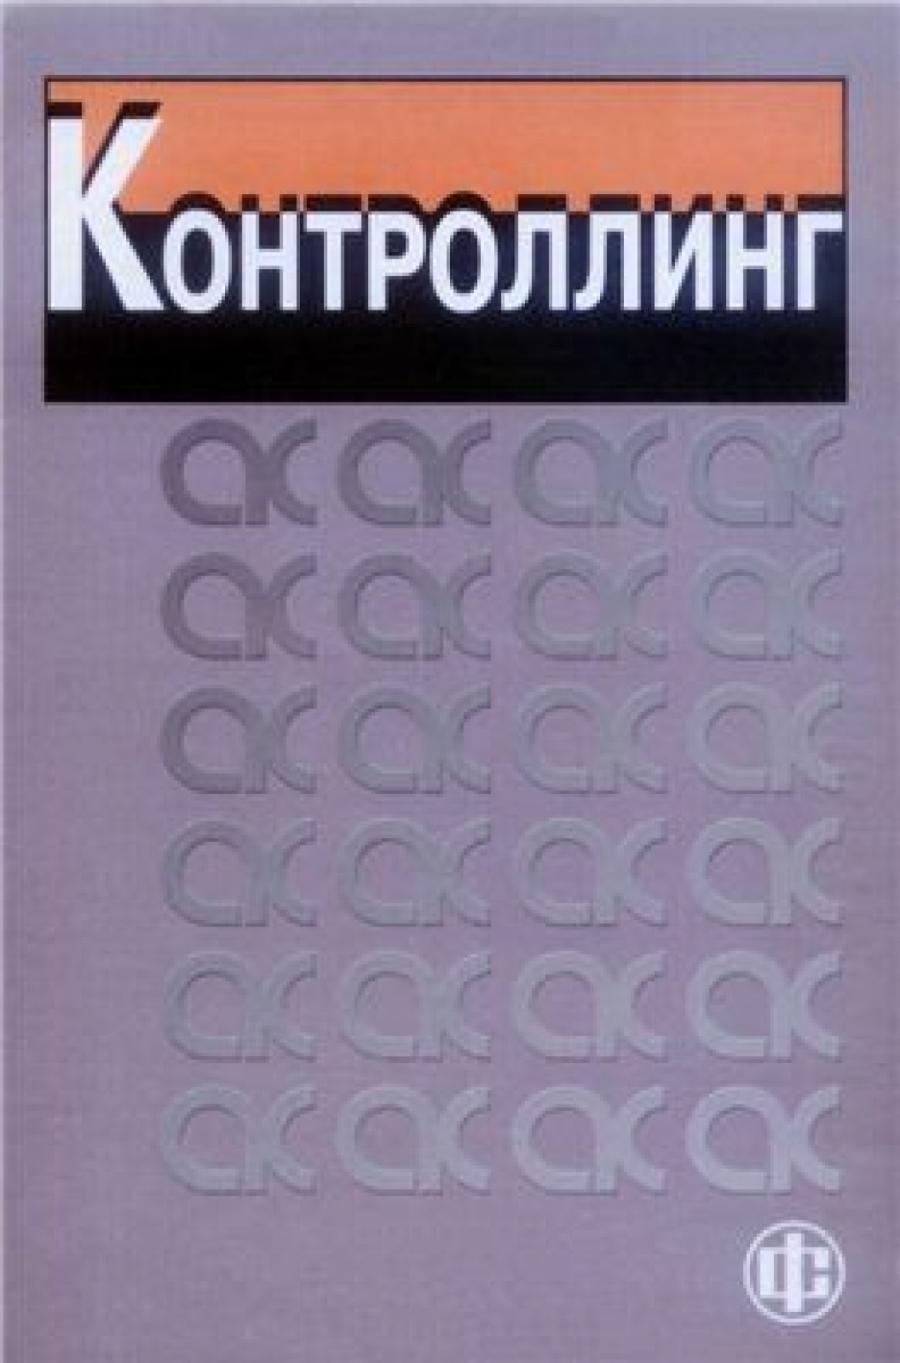 Обложка книги:  а.м. карминский, с.г. фалько, а.а. жевага, н.ю. иванова - контроллинг